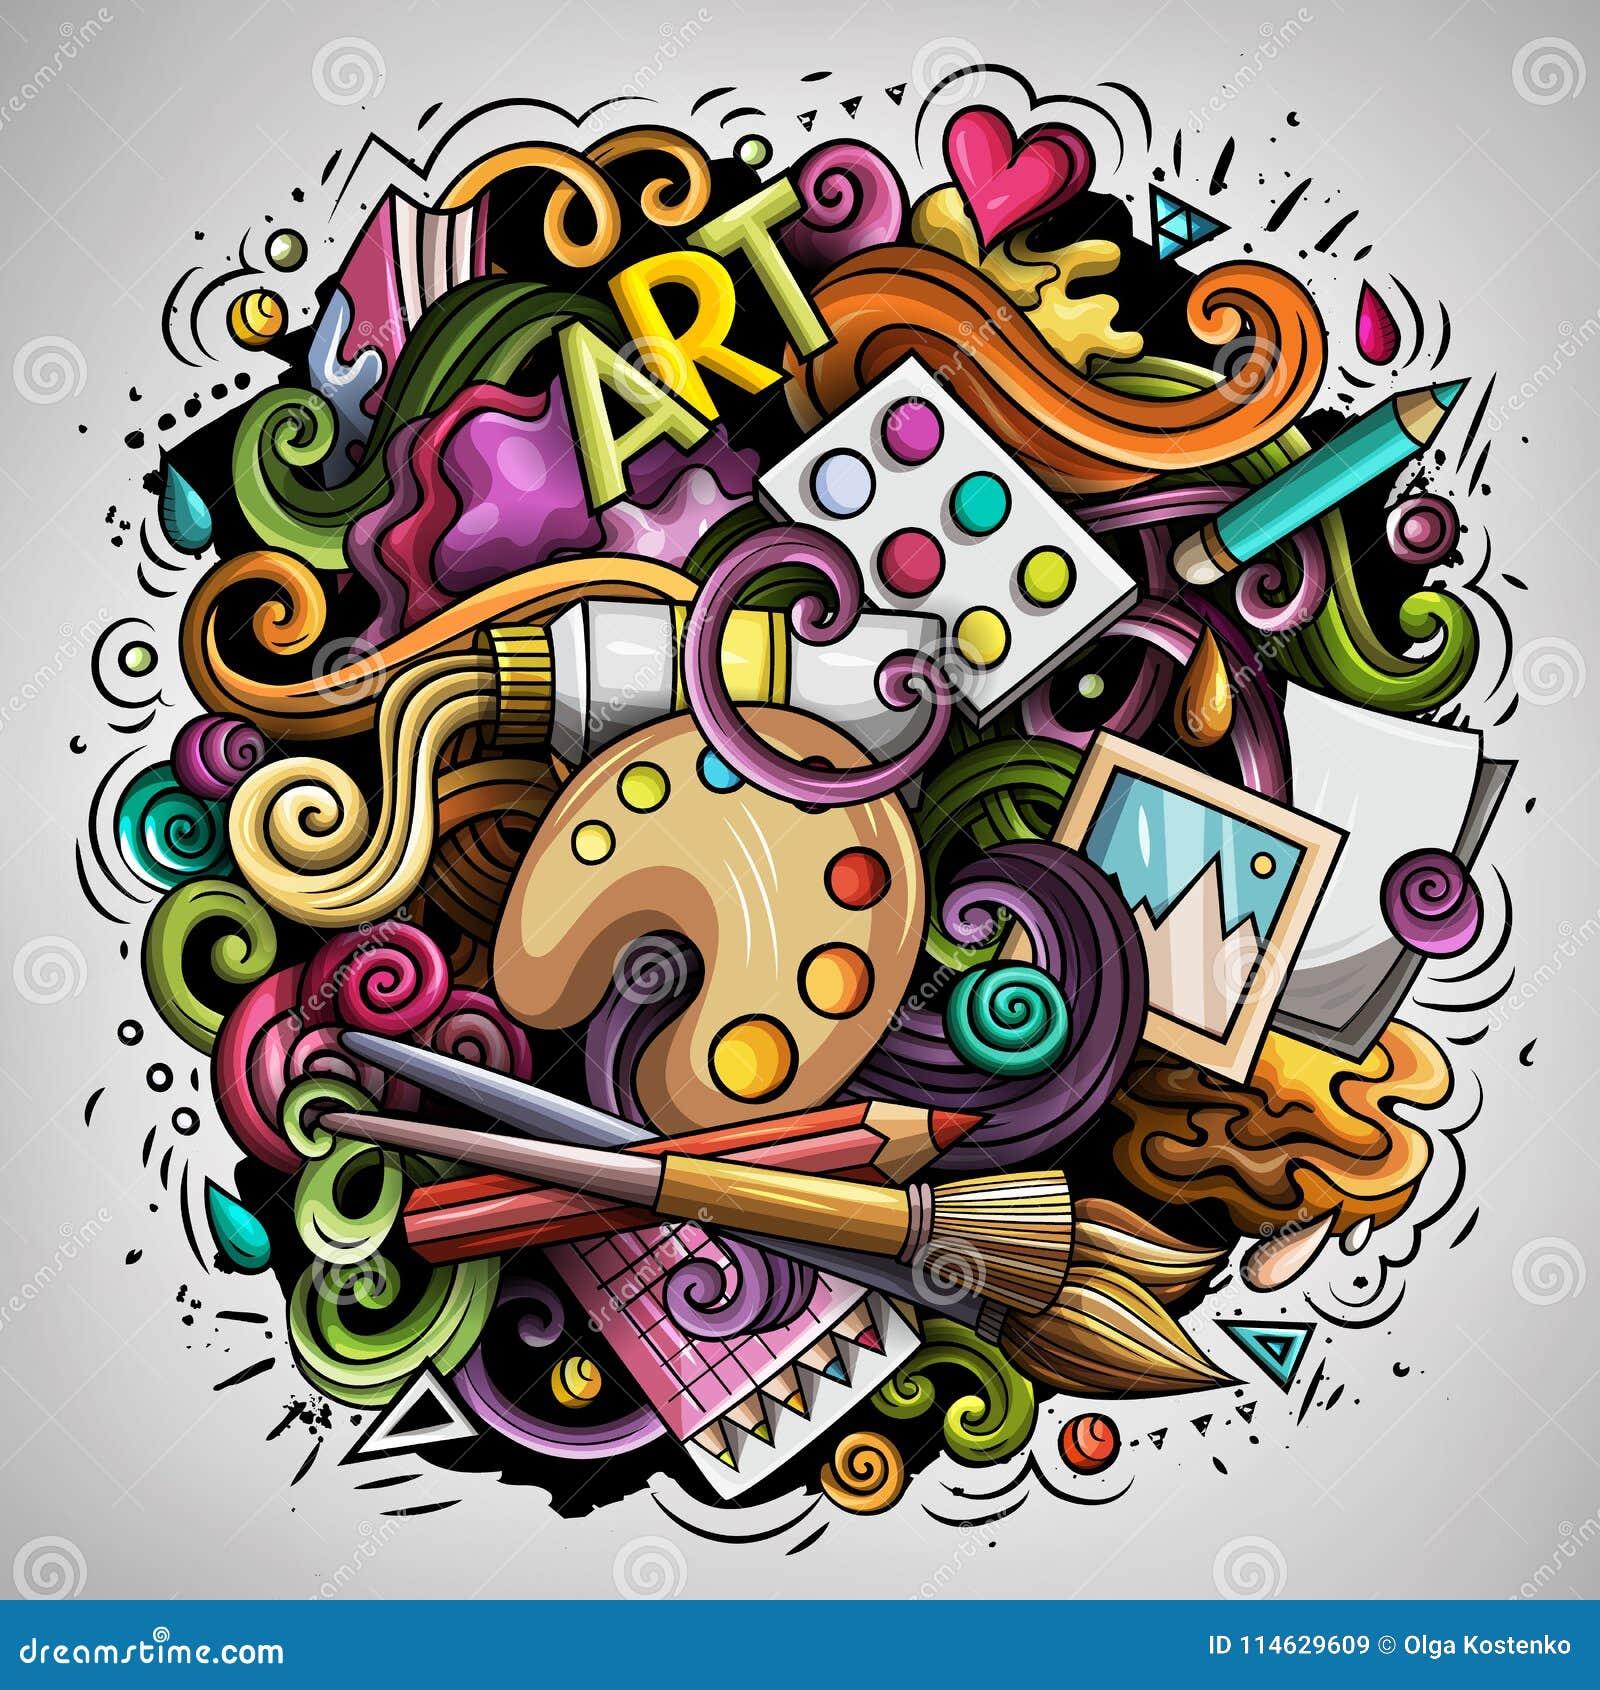 Cartoon Vector Doodles Art And Design Illustration Stock Vector Illustration Of Doodles Objects 114629609